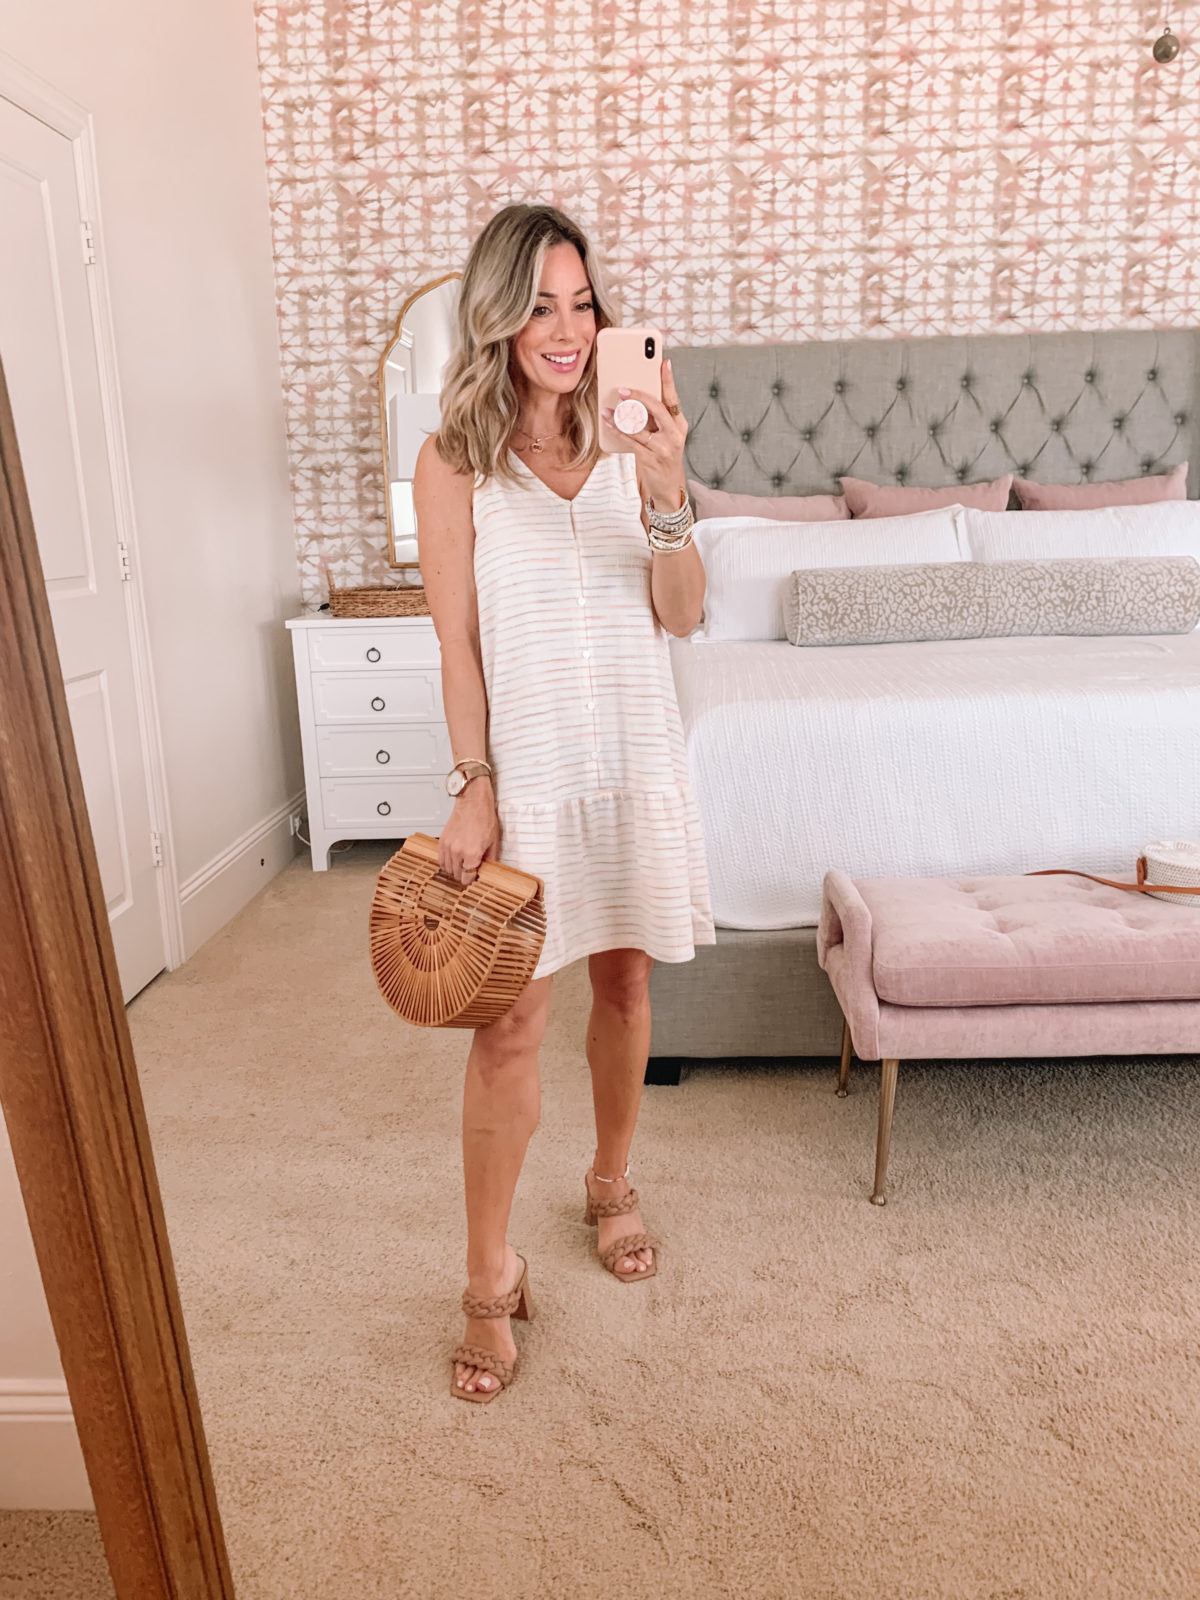 Dressing Room Finds, Shift Dress and Sandals